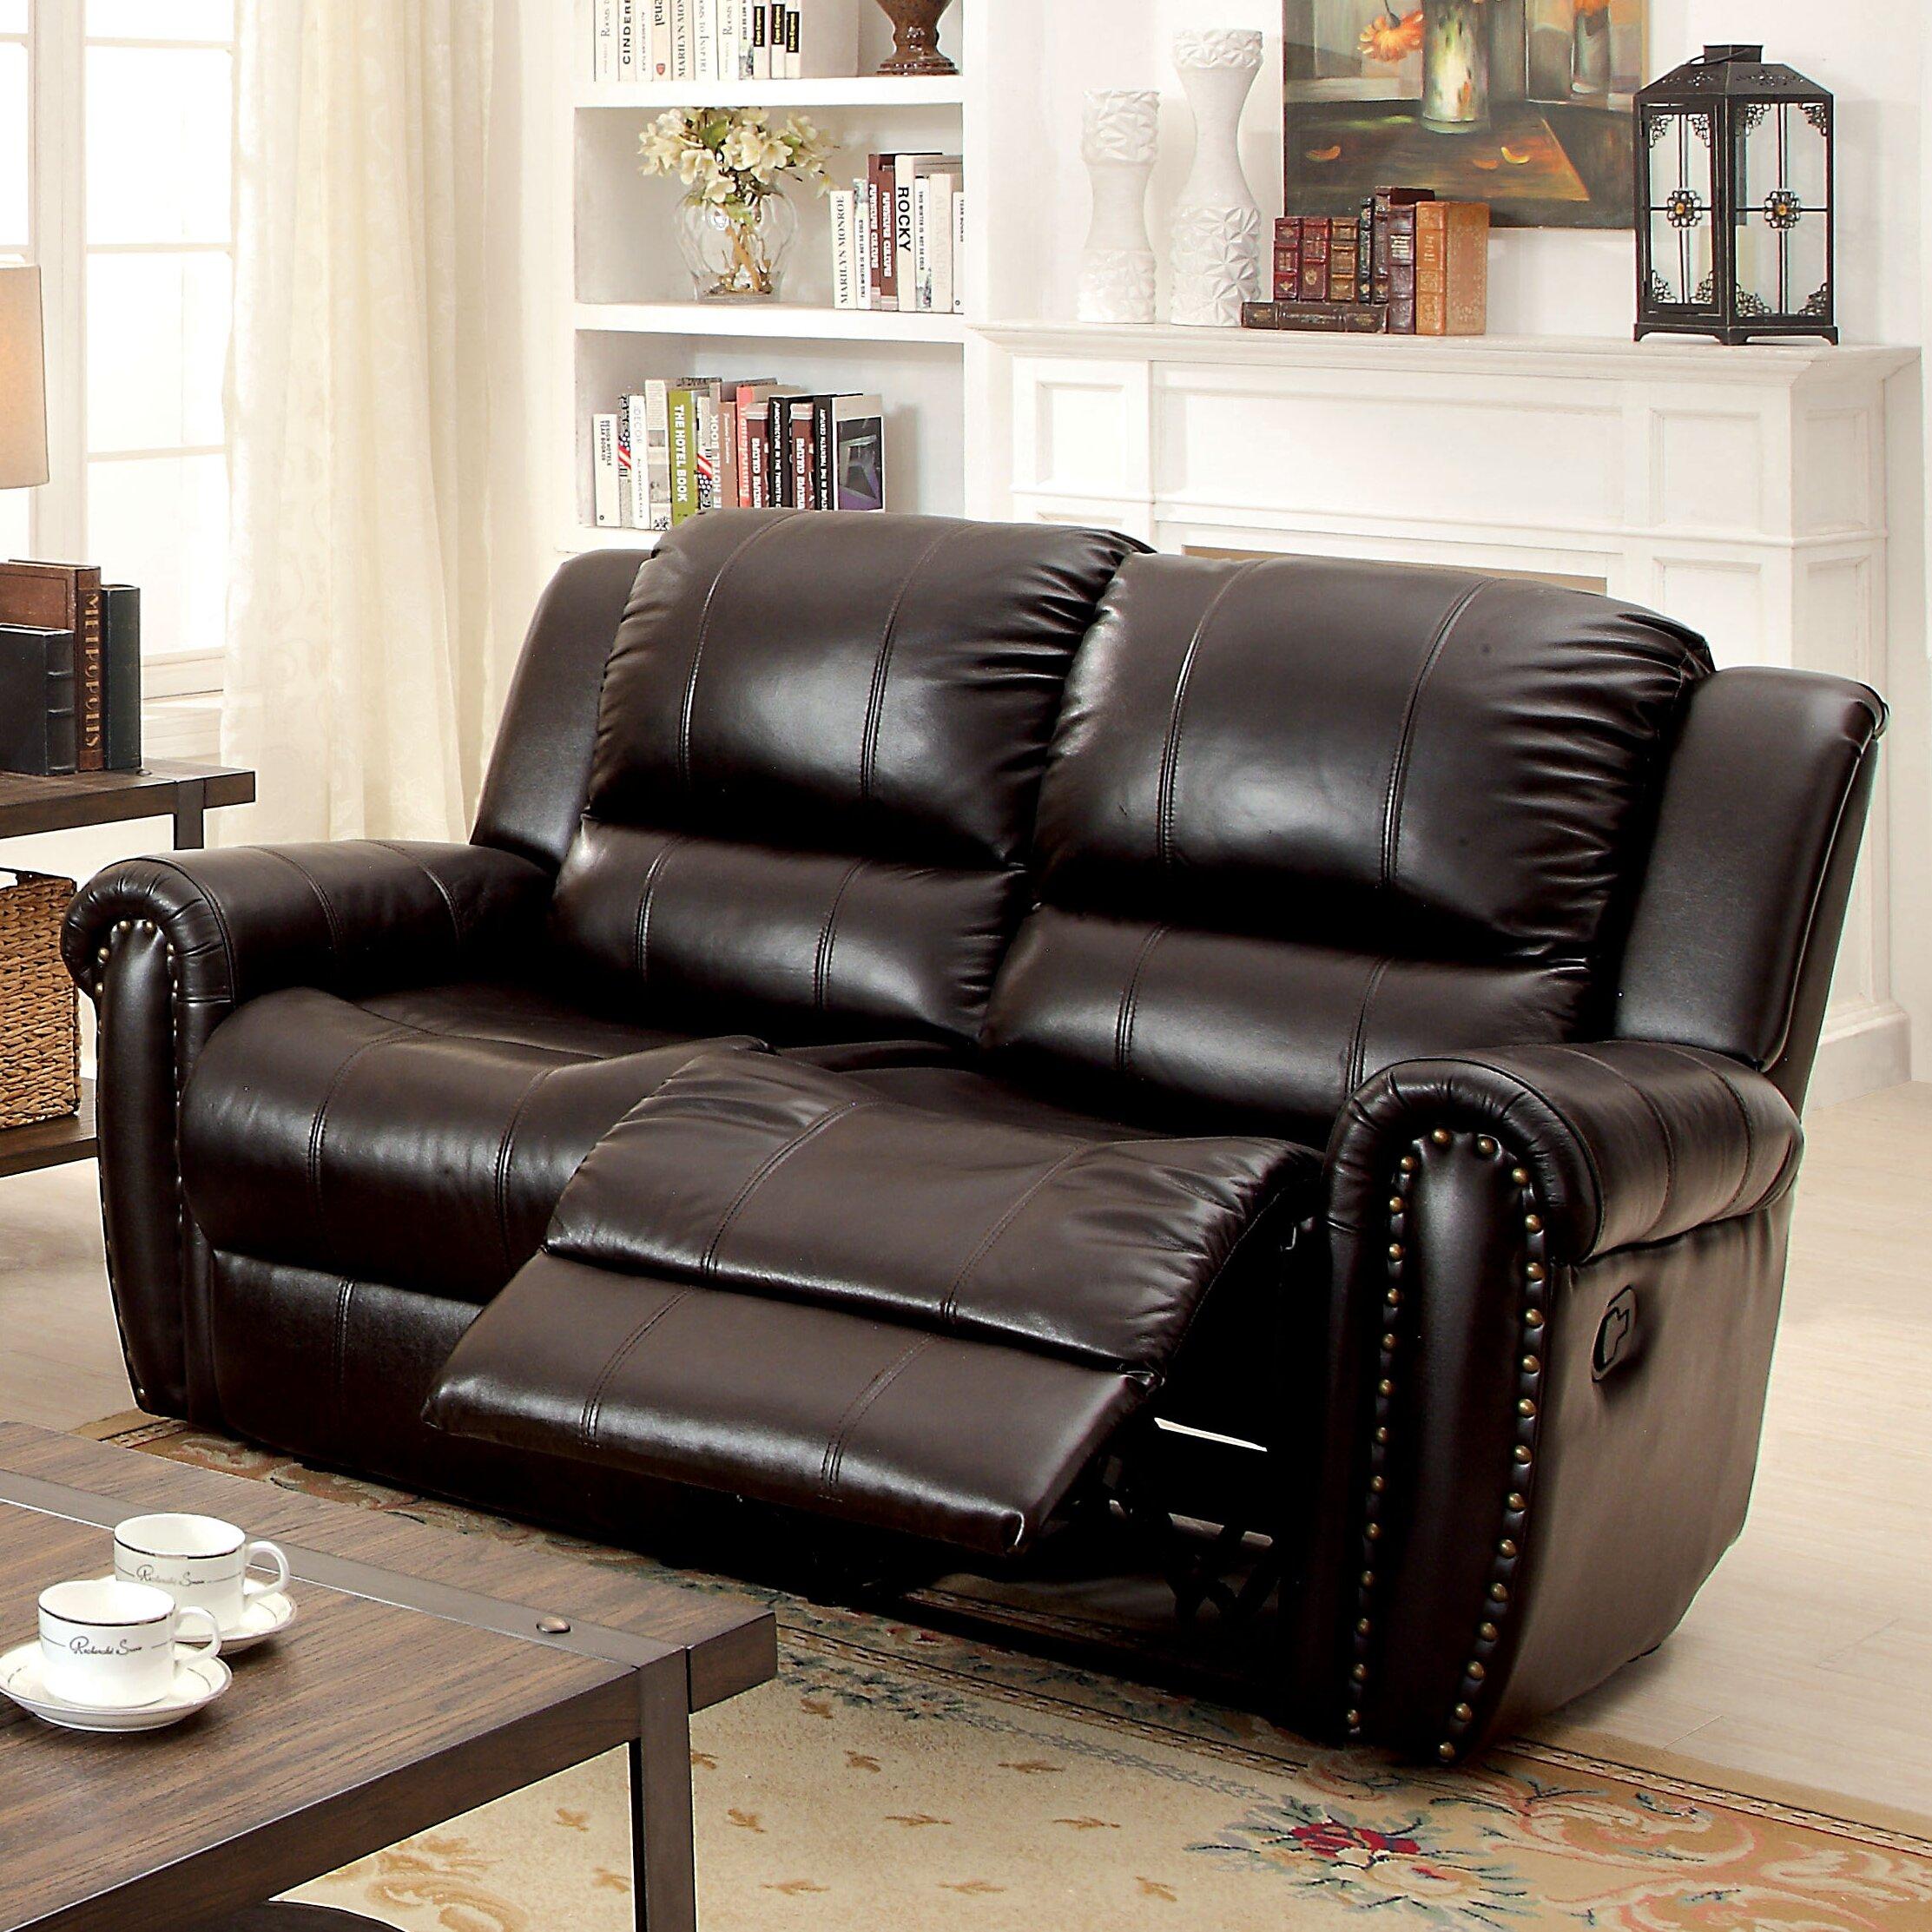 Hokku designs juliana living room collection for Hokku designs living room furniture